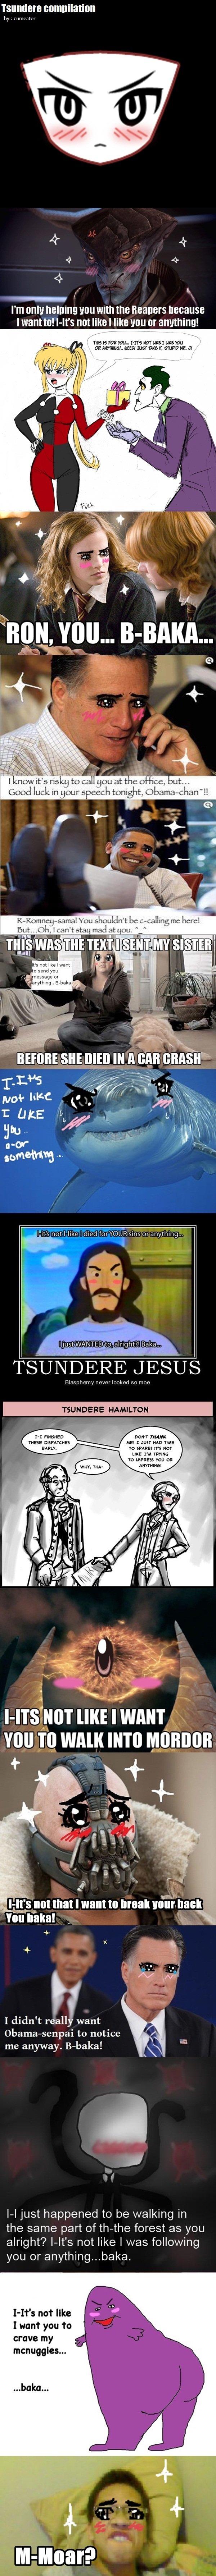 Tsuncomp. B-baka! thx google image and this comment section funnyjunk.com/channel/animemanga/tsundere+mom/frXgGse/.